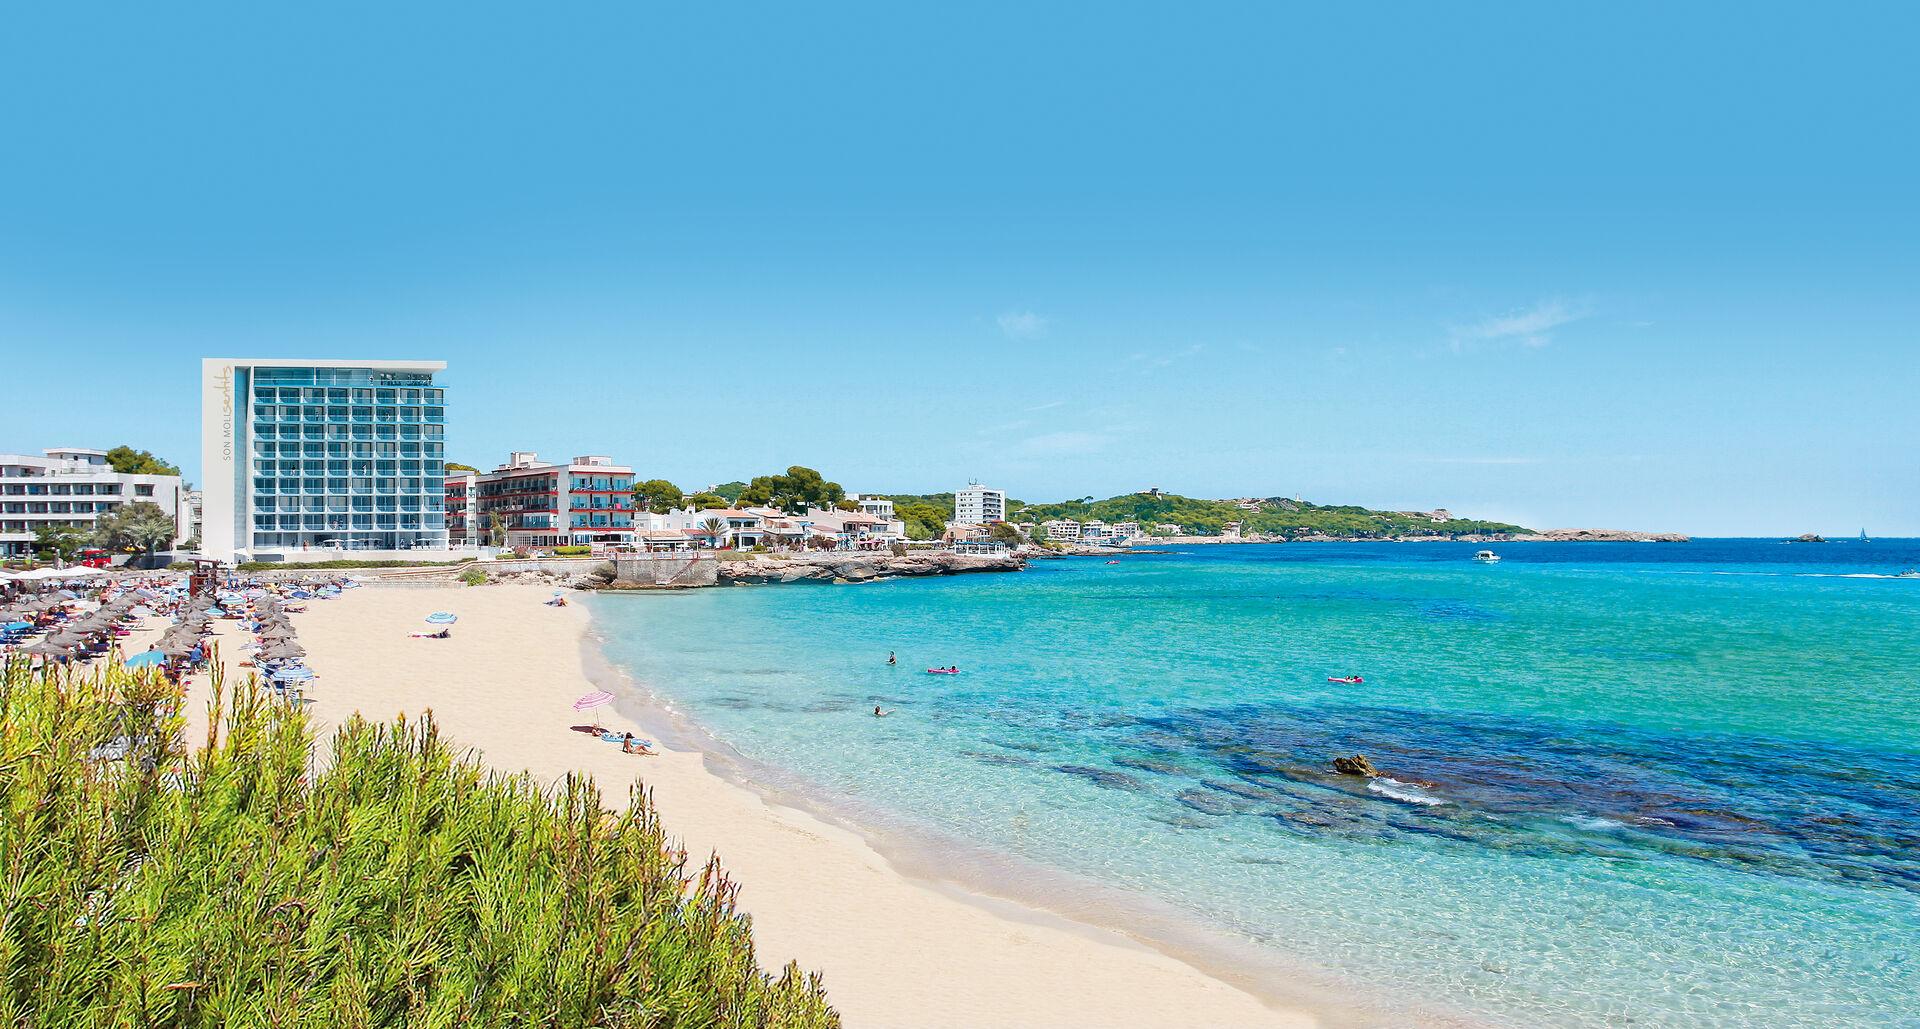 Séjour Palma de Majorque - Hotel Son Moll Sentis - 4*